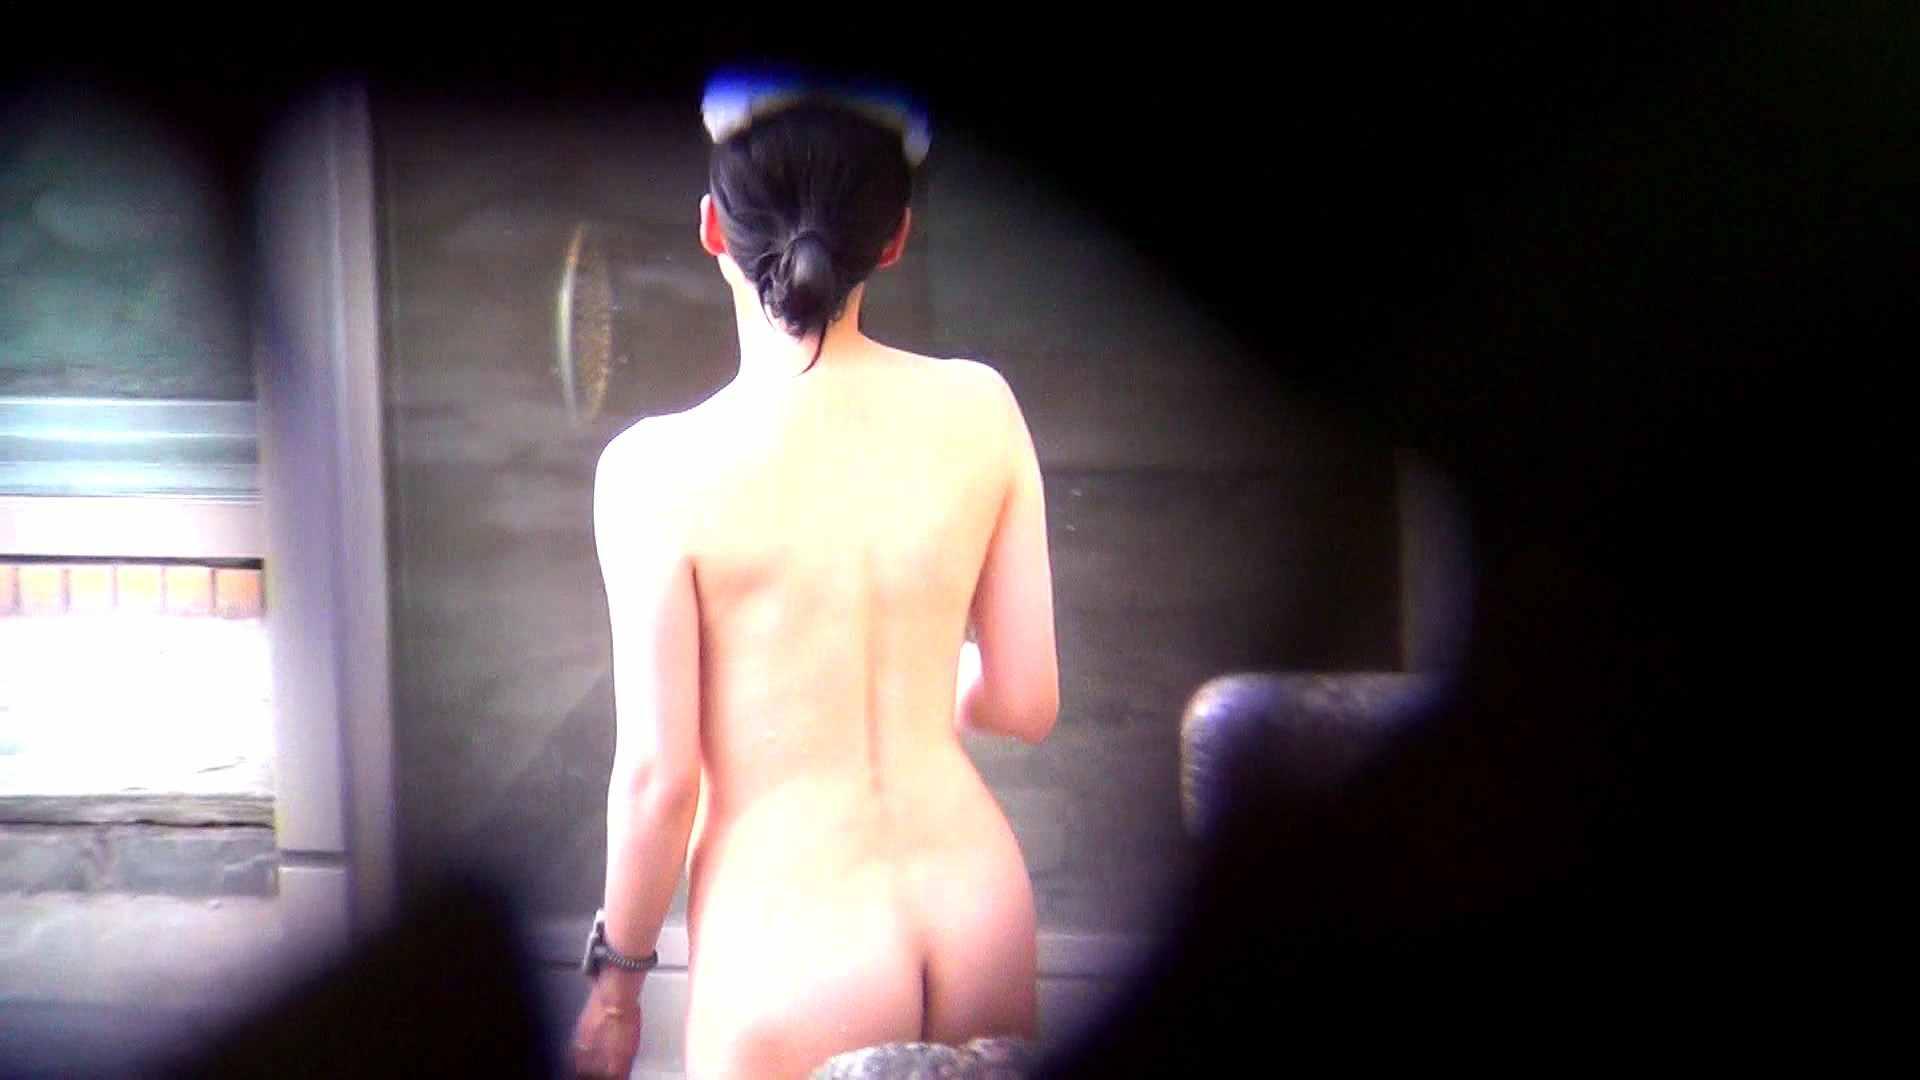 Vol.60 細身美女の股間から垂れているタコ糸 美肌 SEX無修正画像 74画像 9